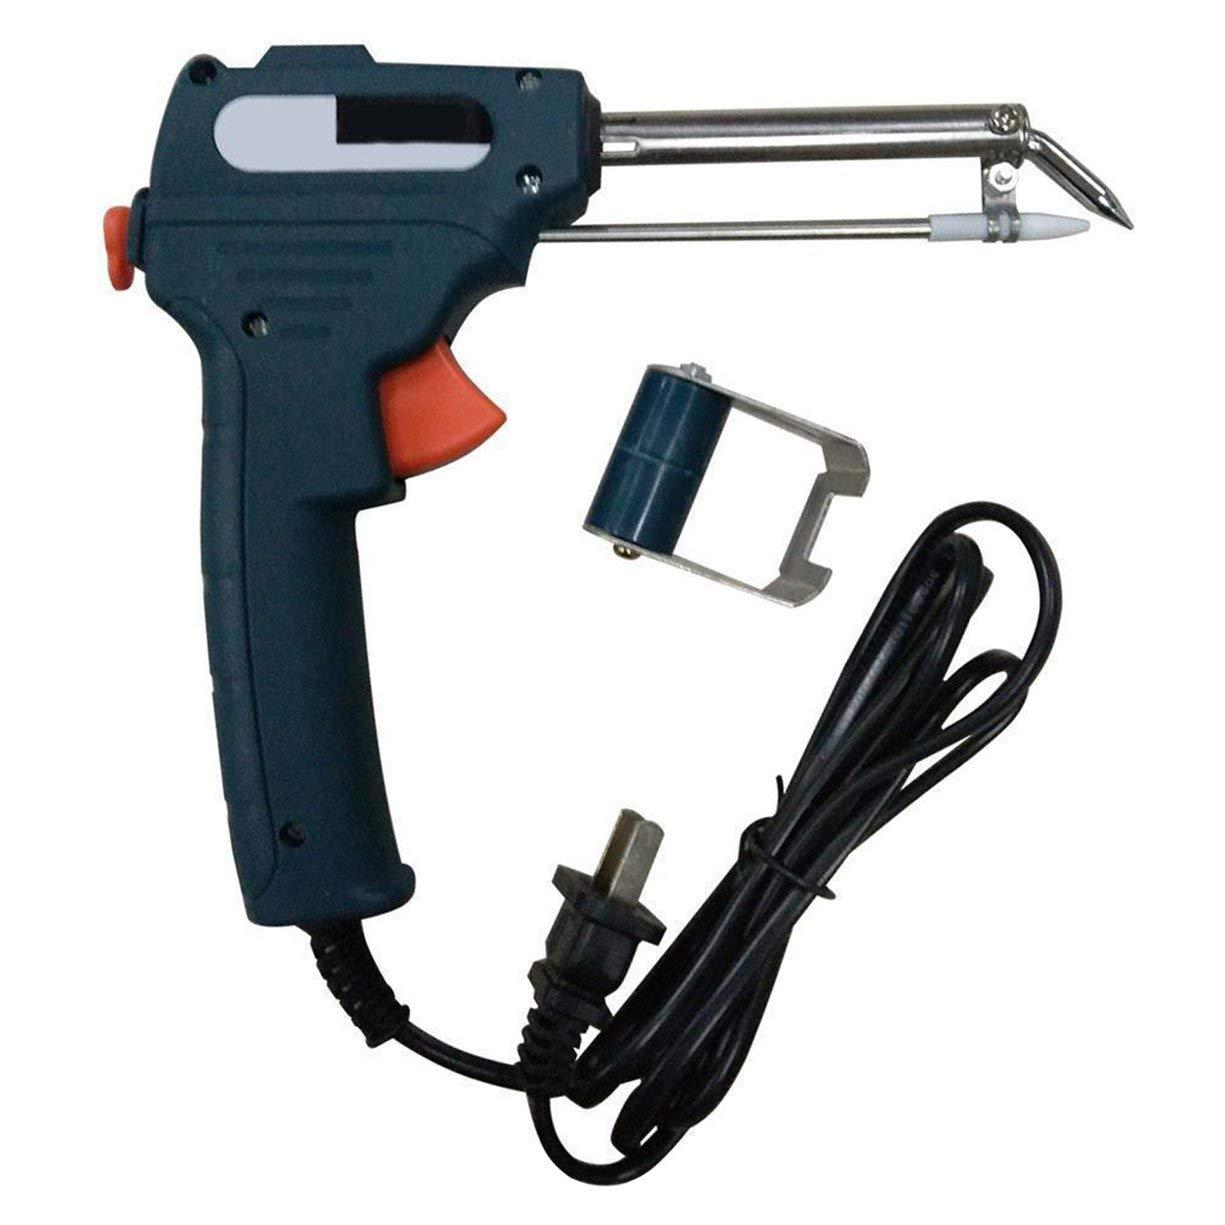 220V 60W Manual Soldering Gun Electric Gun Type Iron Automatic Soldering Machine Automatically Send Tin Fast Heating